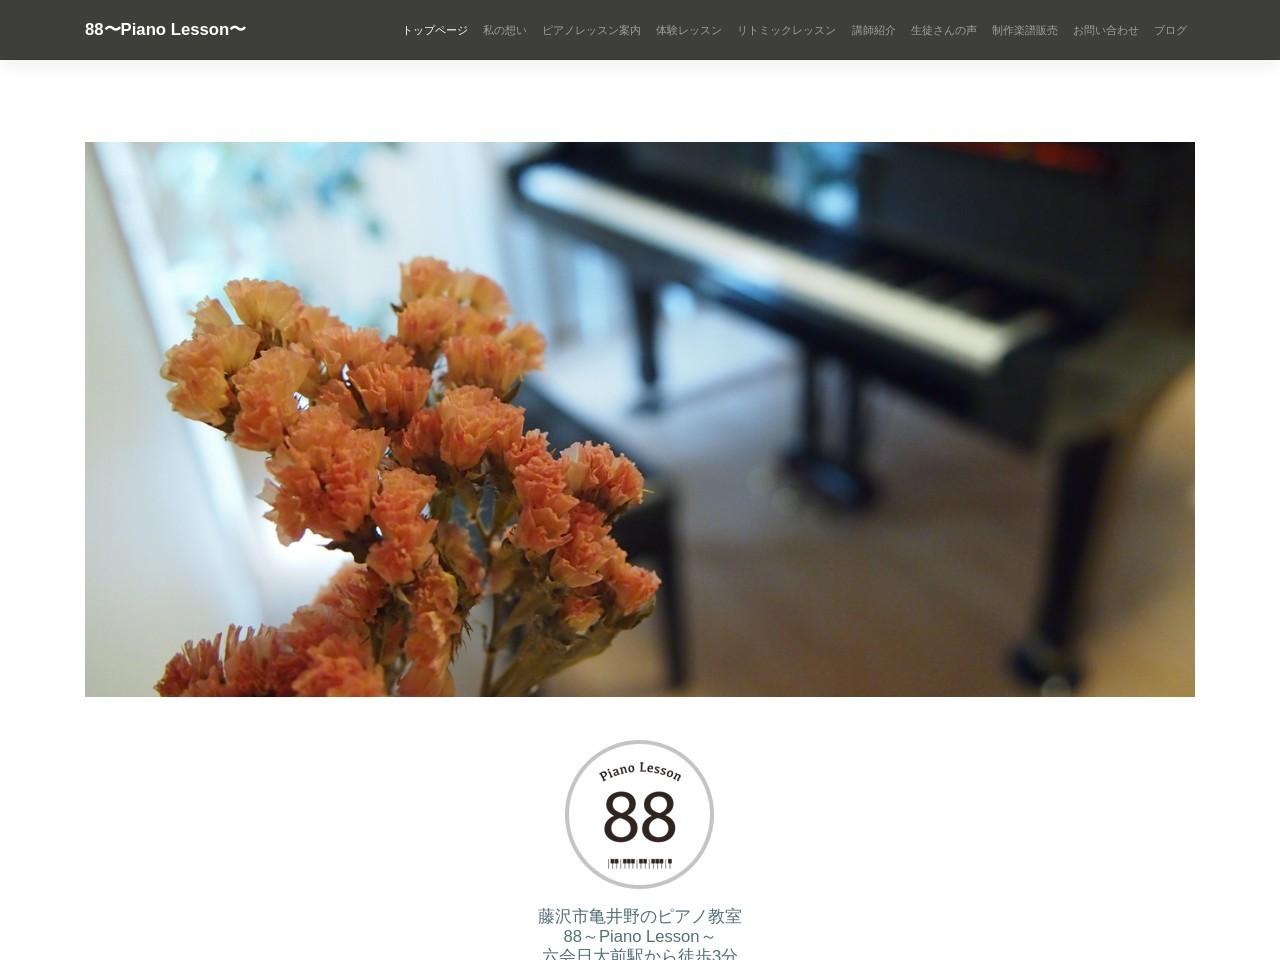 88~Piano Lesson~のサムネイル